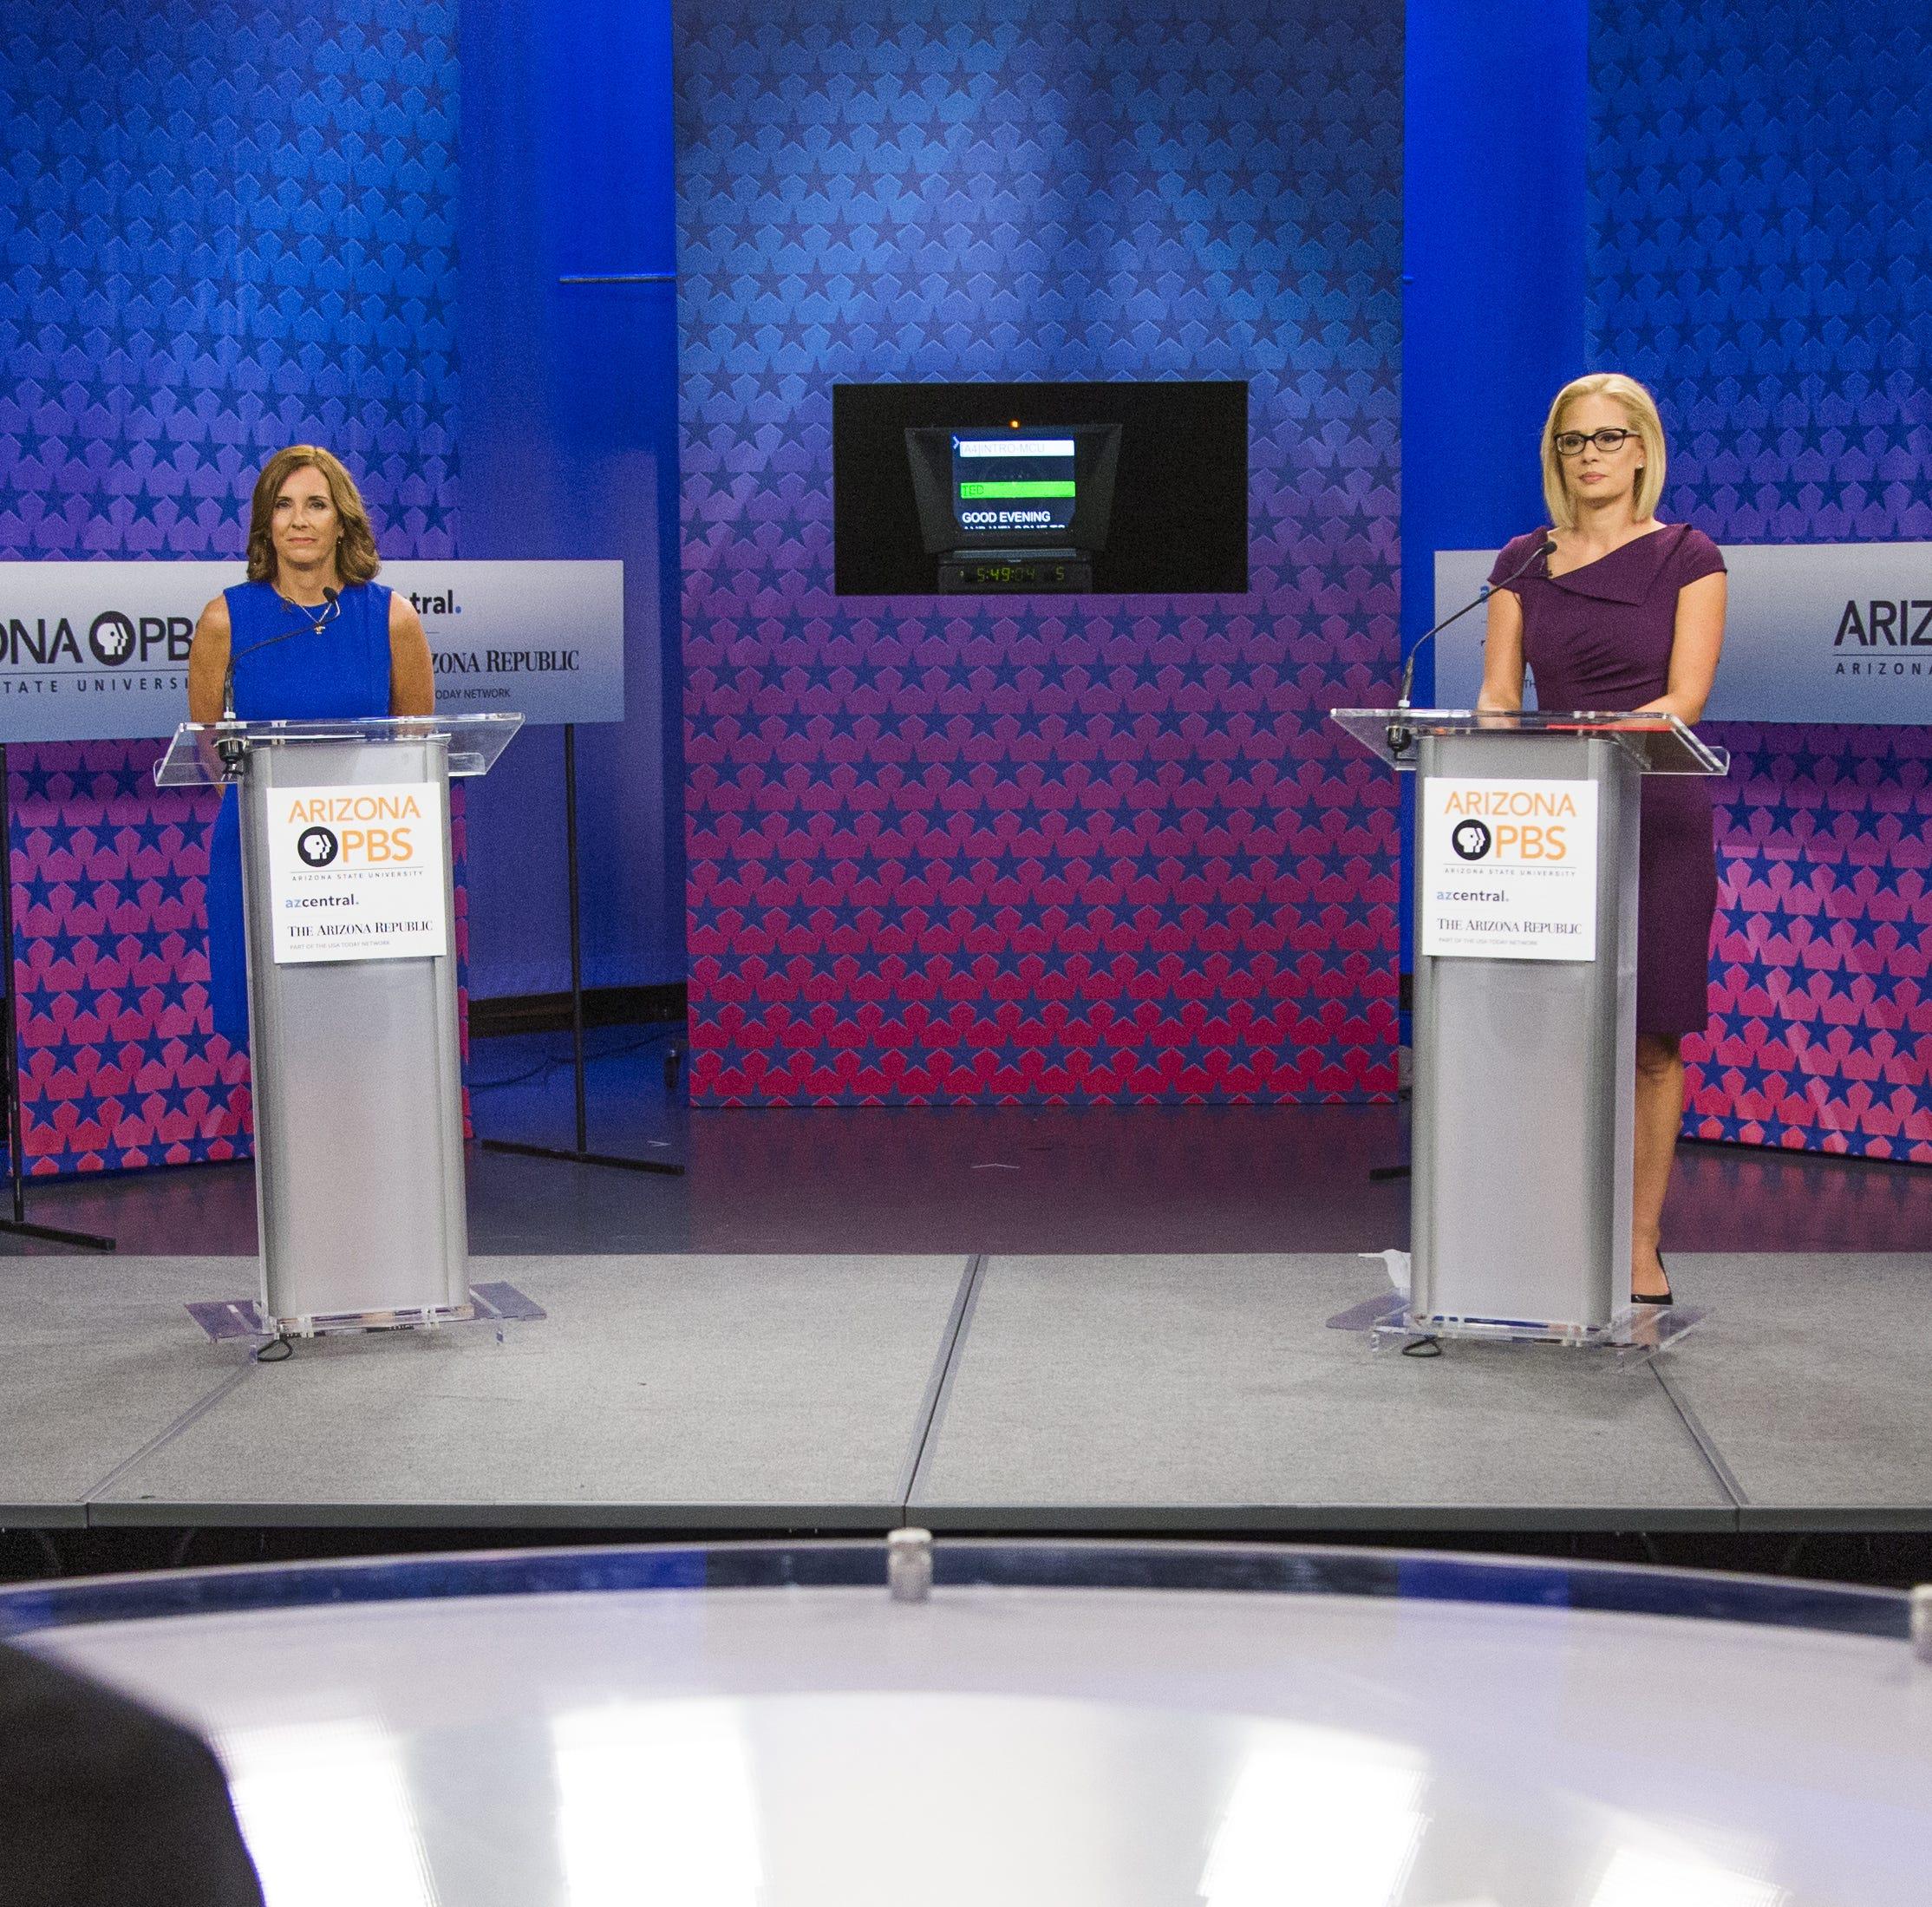 Debate expert breaks down body language, tone and tension during McSally-Sinema debate